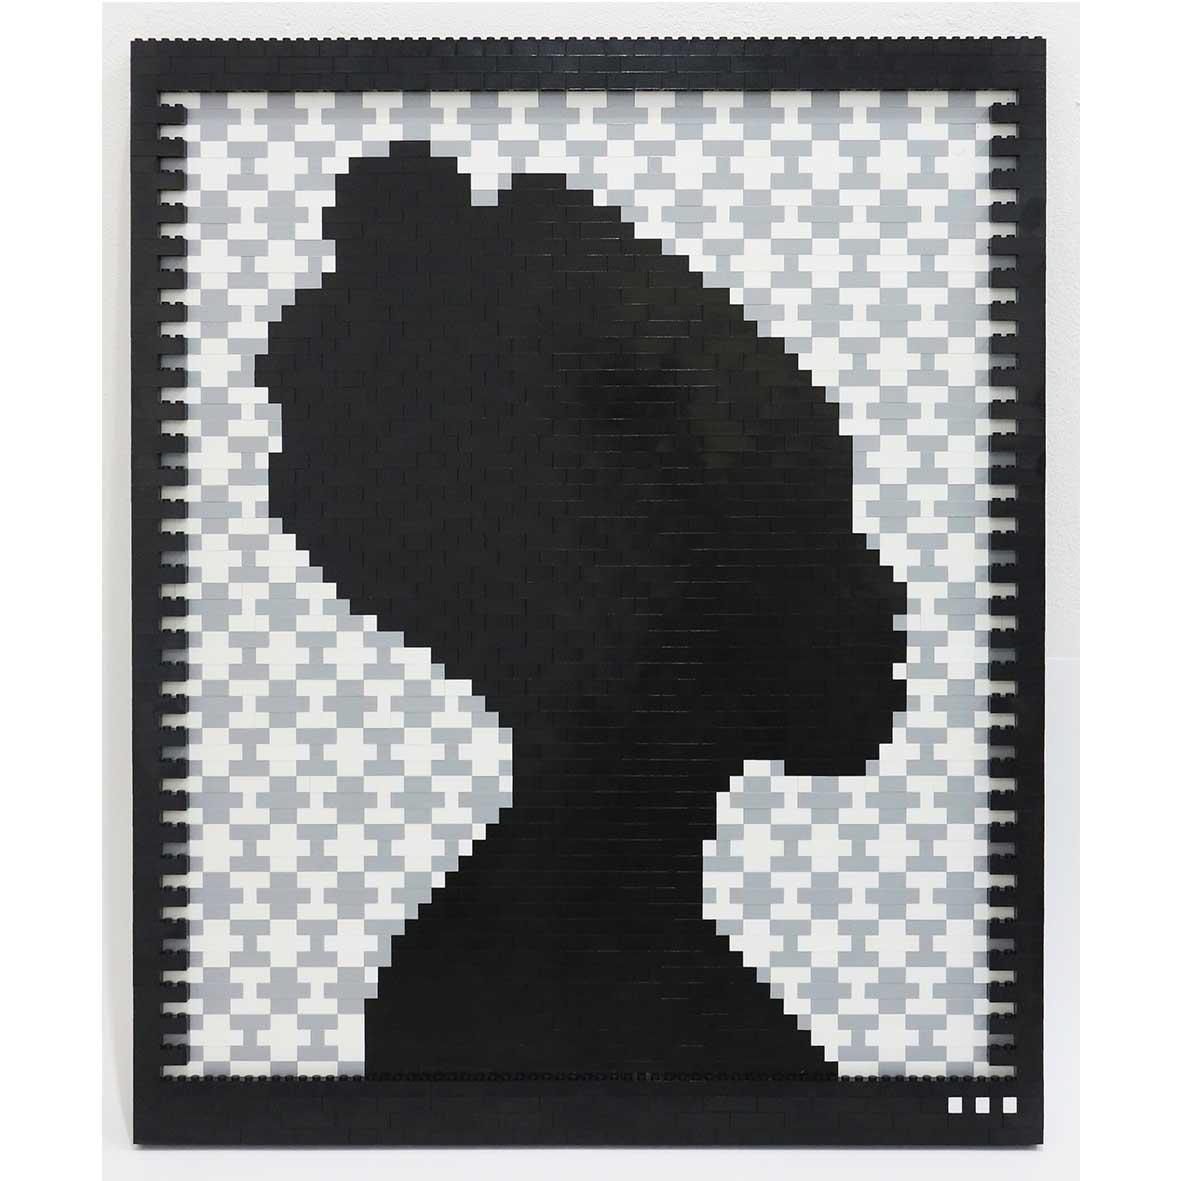 Faatimah Mohamed-Luke Reflections of a Queen II Ashanti – Grey, 2018 2089 ABS plastic building blocks adhered to Aluminium 65 x 53.5 cm